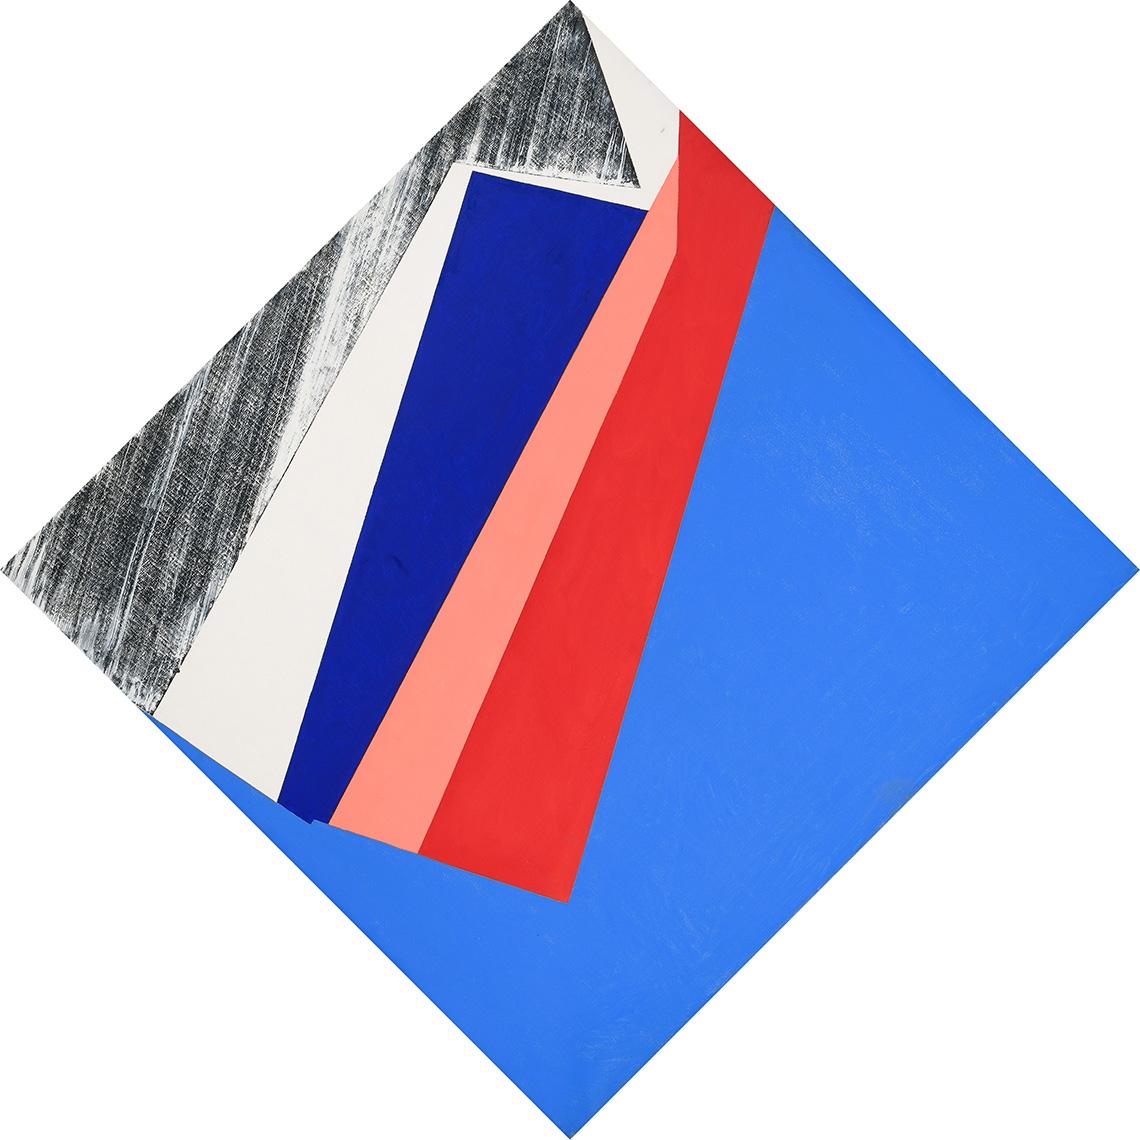 SIN TITULO. 1966. Oleo sobre tela. 170 x 170 cm